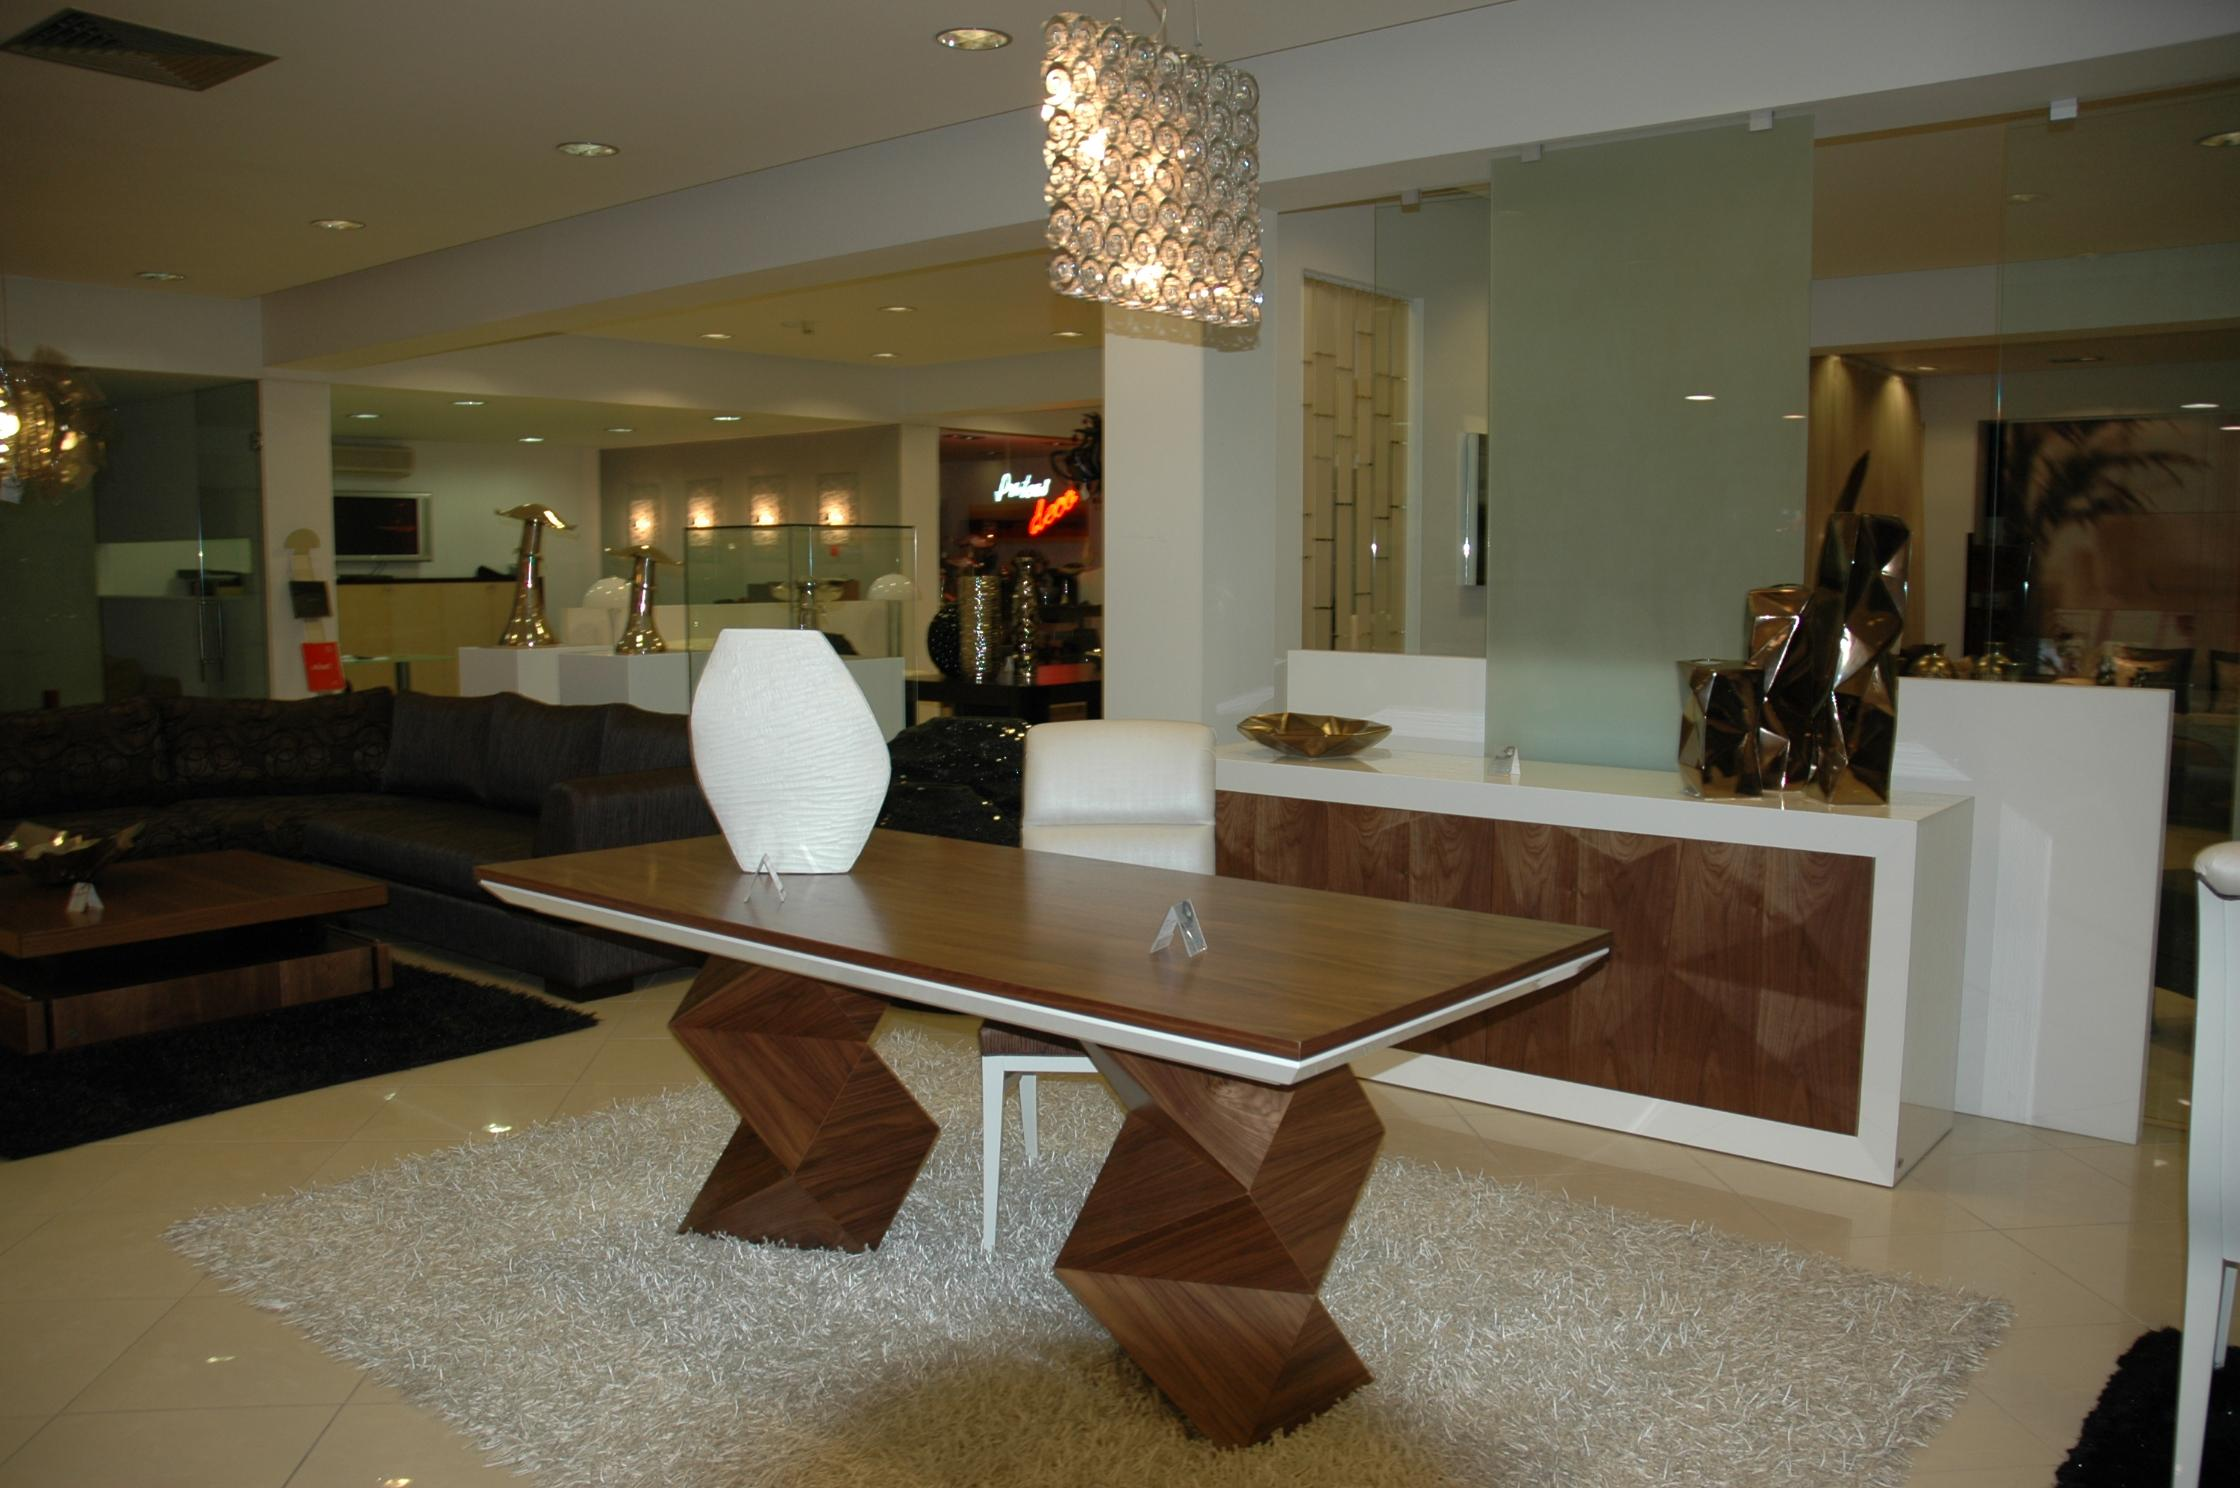 Set Sala Da Pranzo Design #5E4C2D 2240 1488 Sala Da Pranzo Pareti